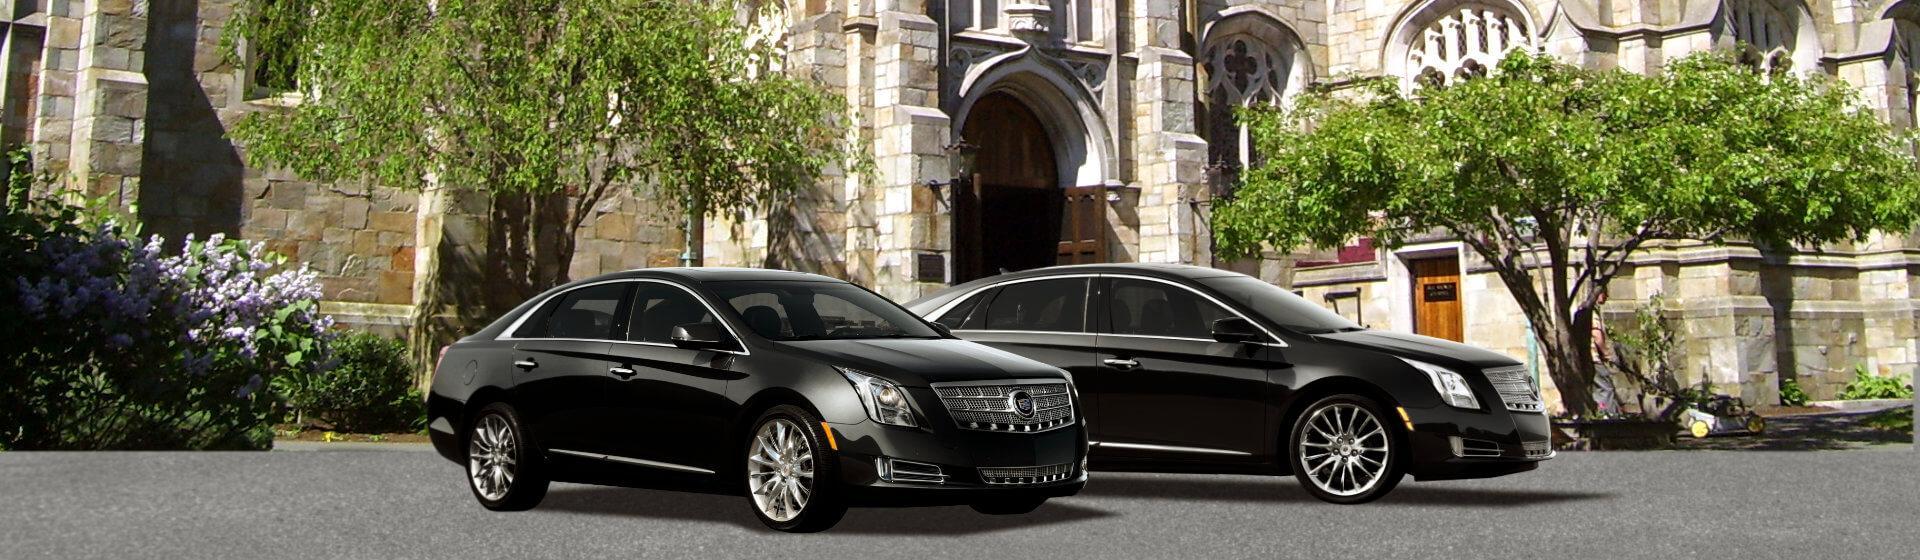 Excellence Car Service